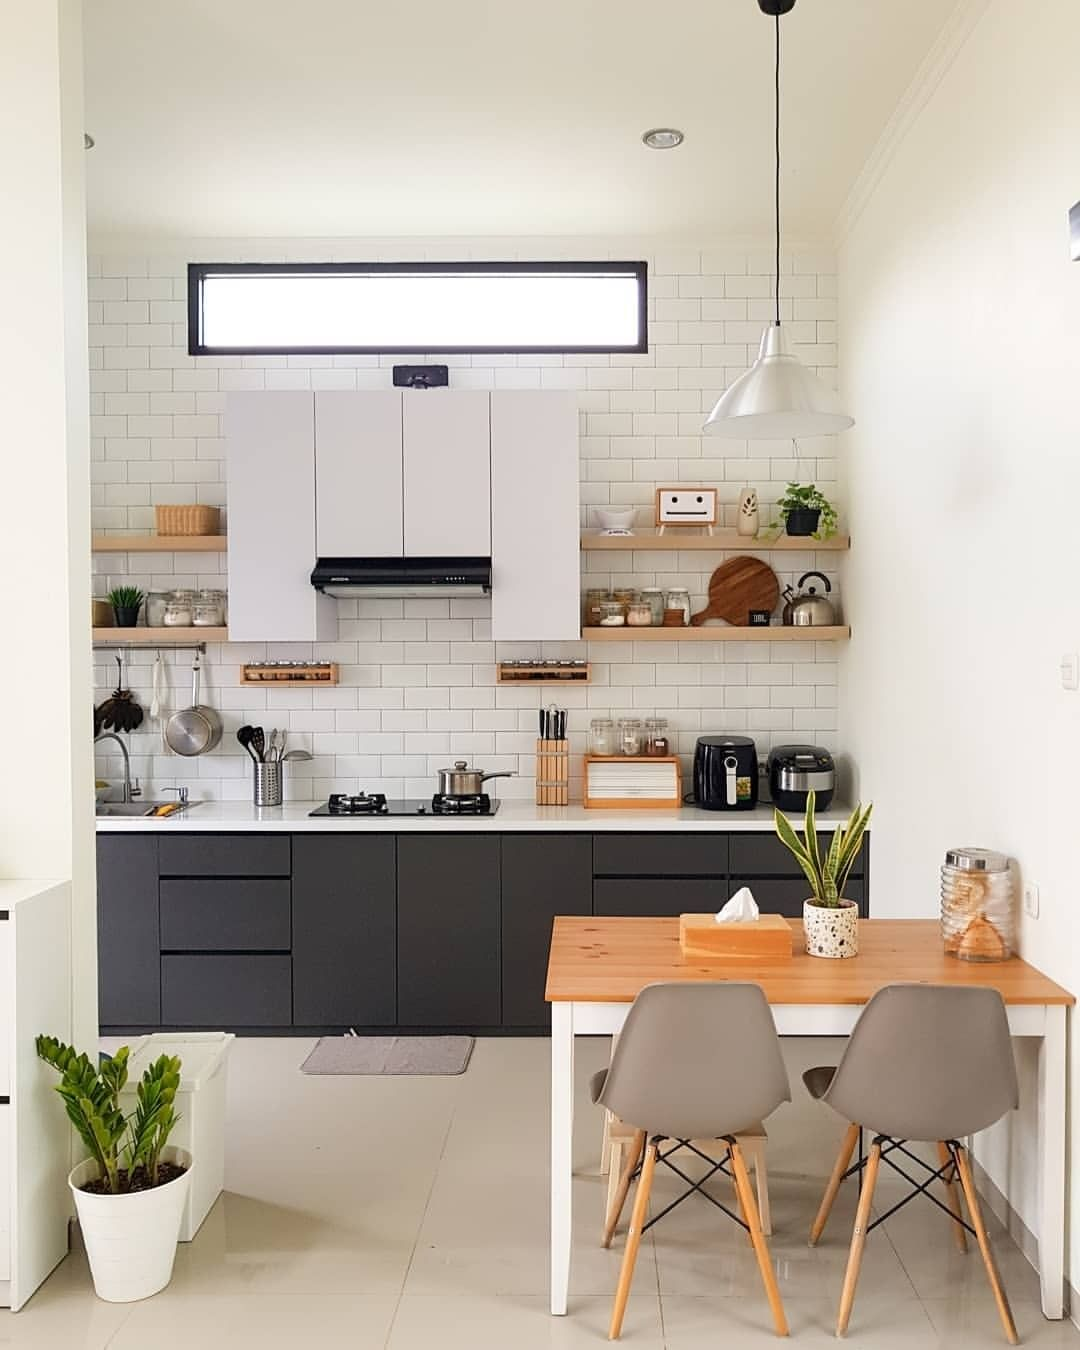 15 Model Kitchen Set Minimalis Dapur Kecil Sederhana Namun ...